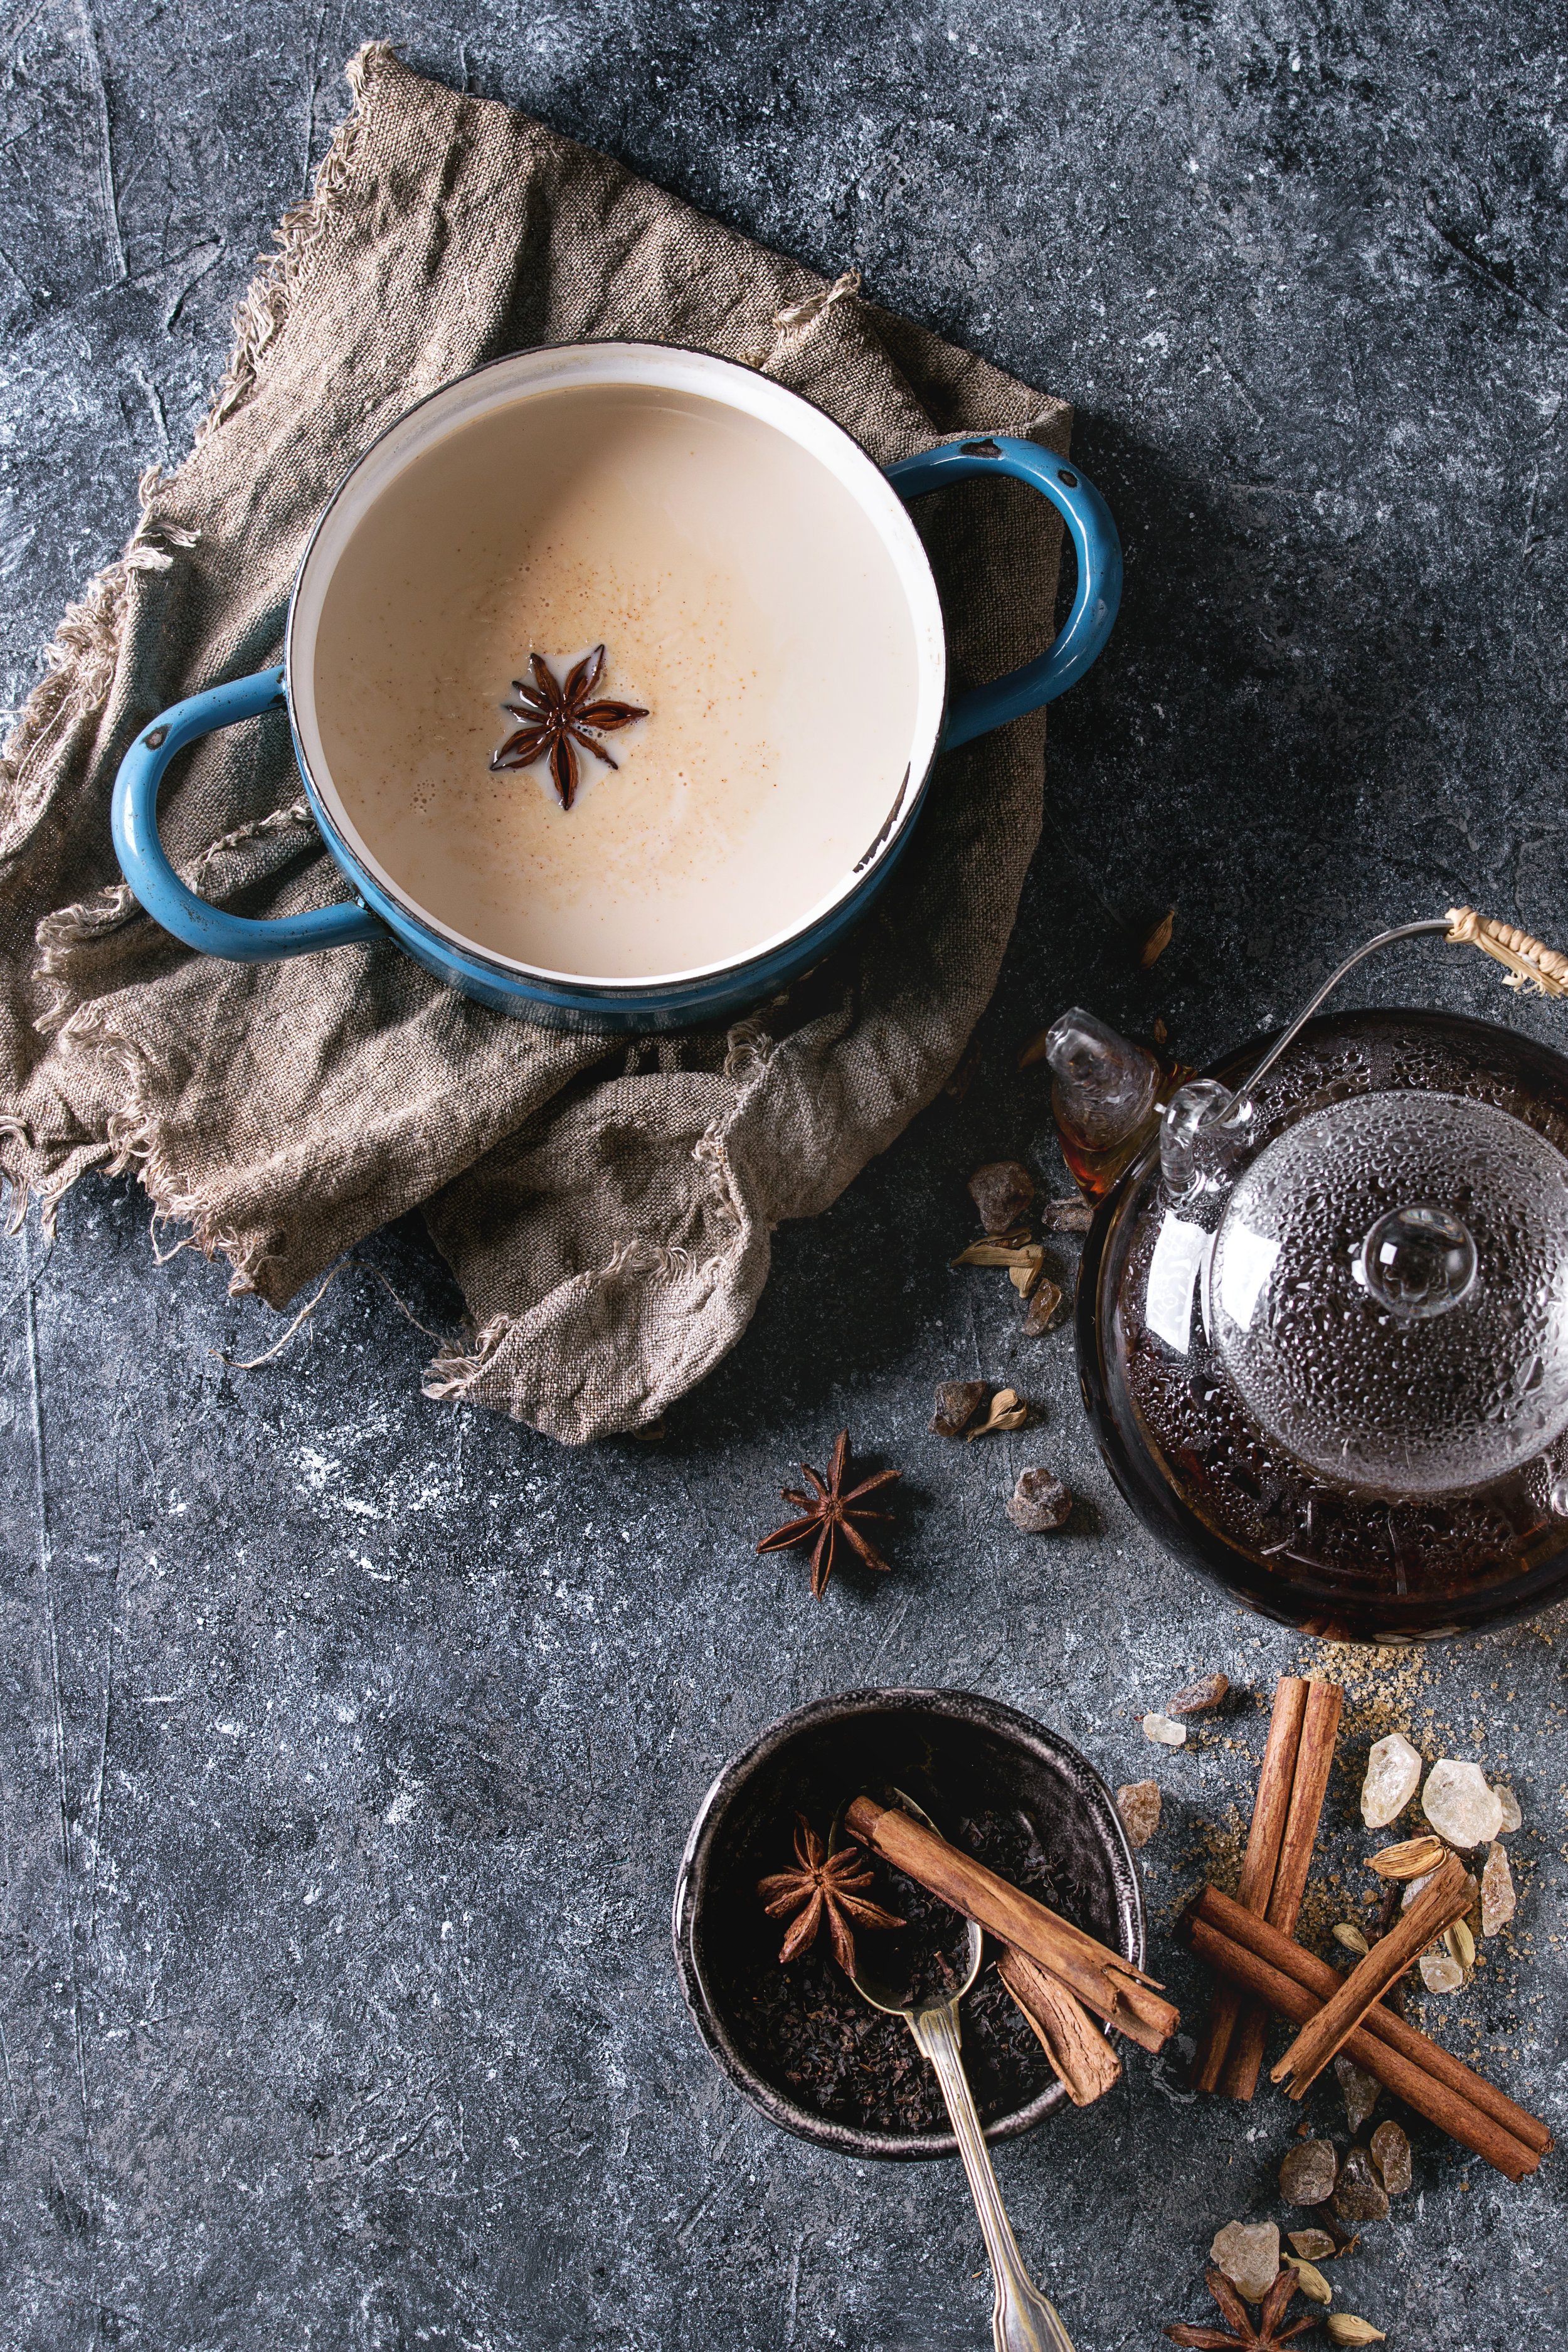 masala-chai-with-ingredients-PA7CD68.JPG